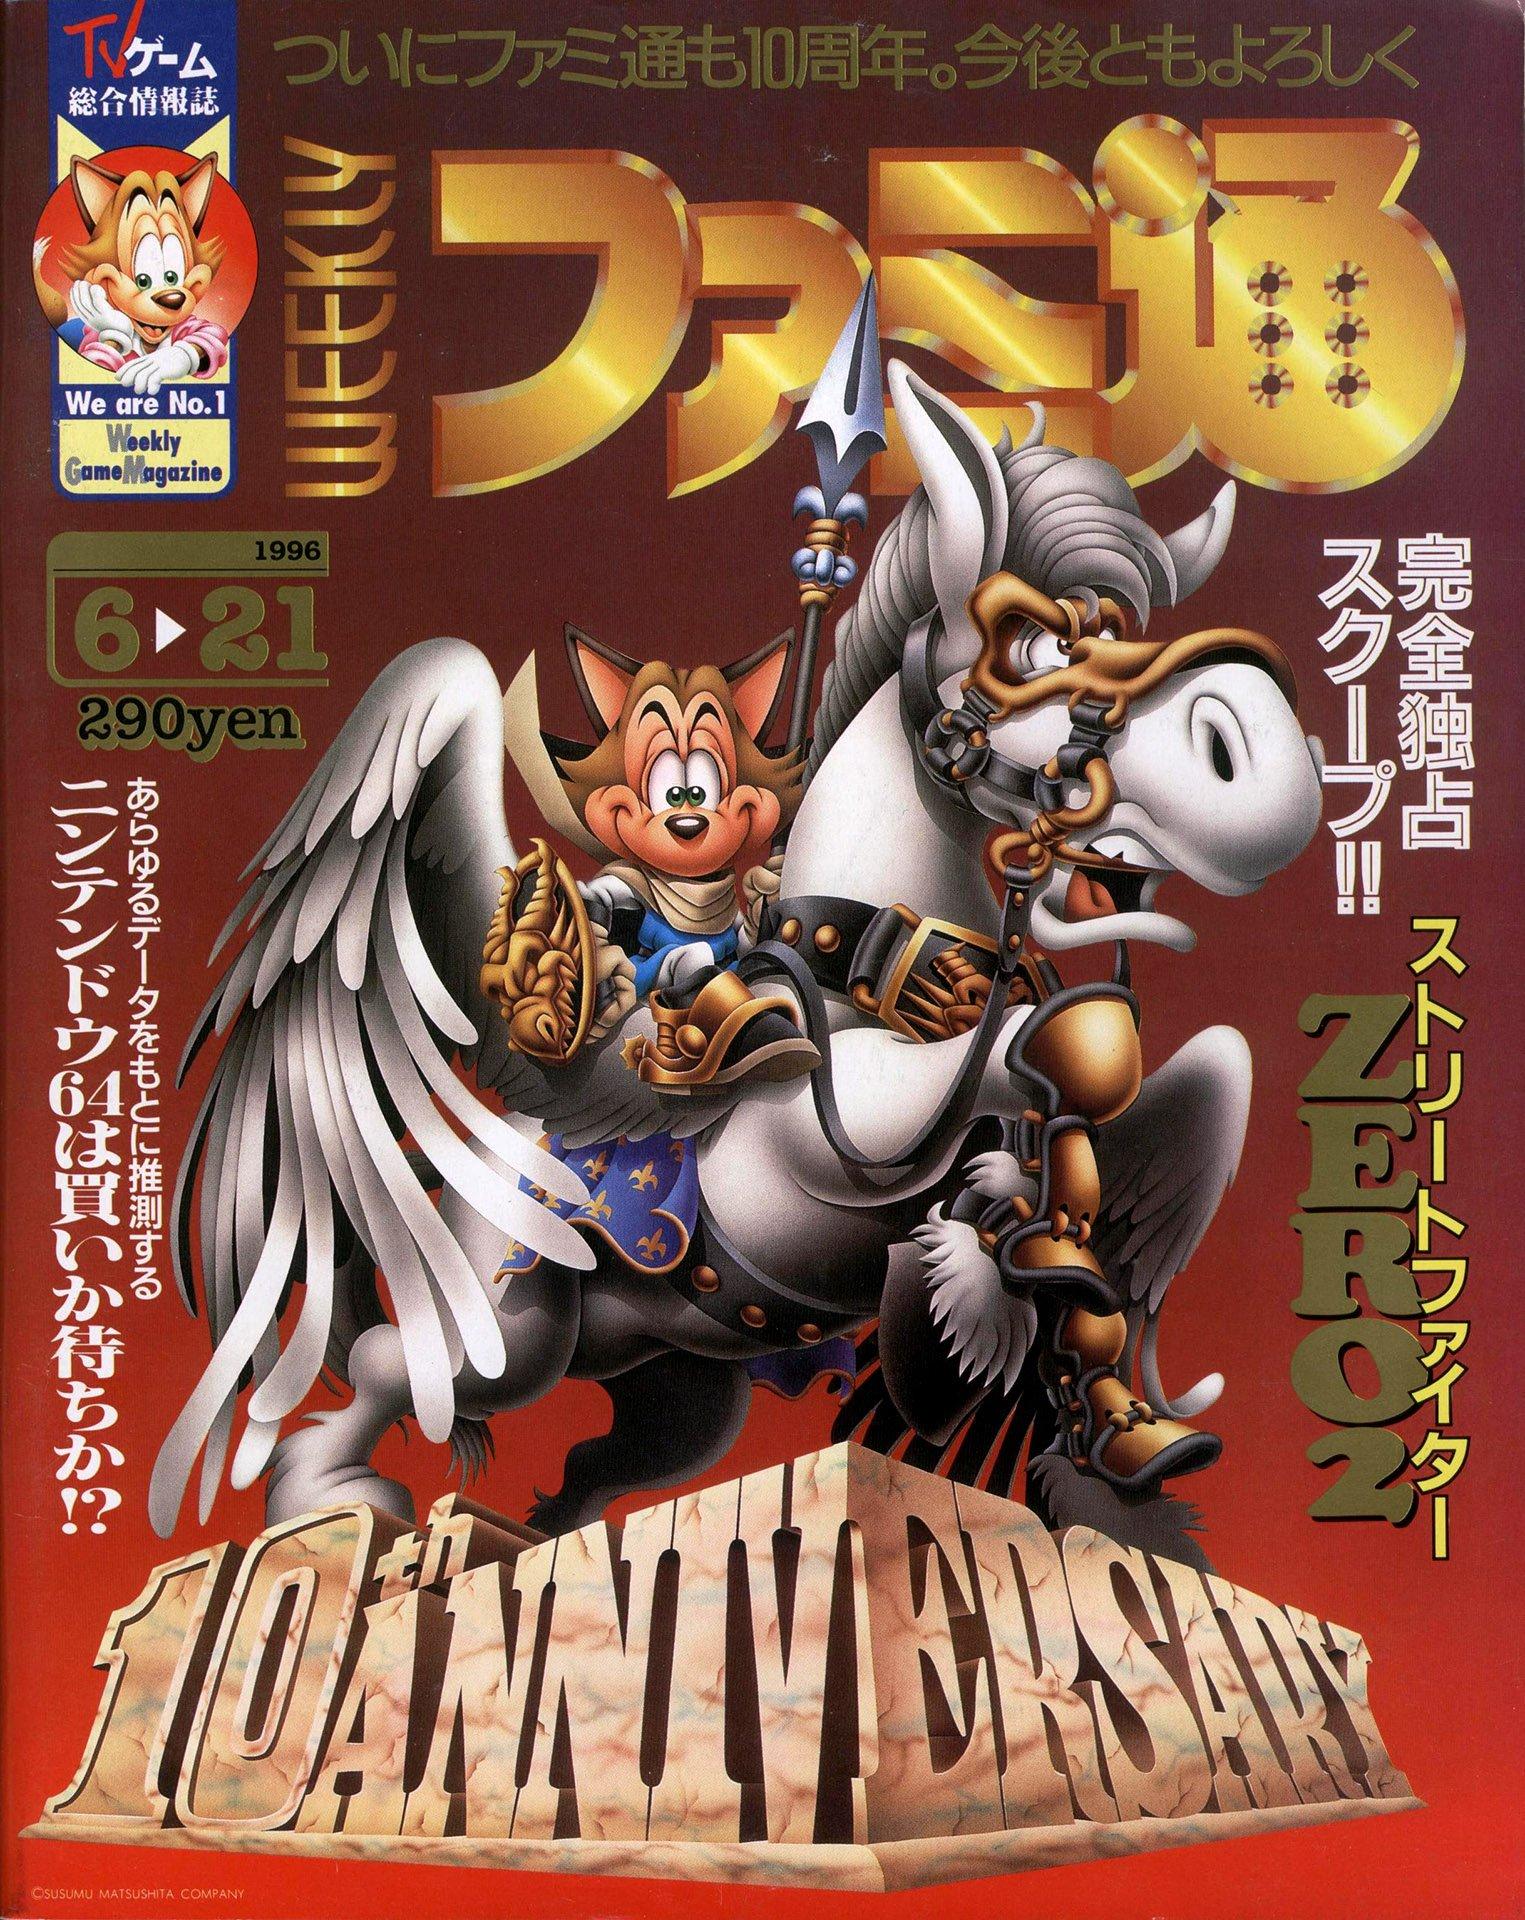 Famitsu 0392 (June 21, 1996)